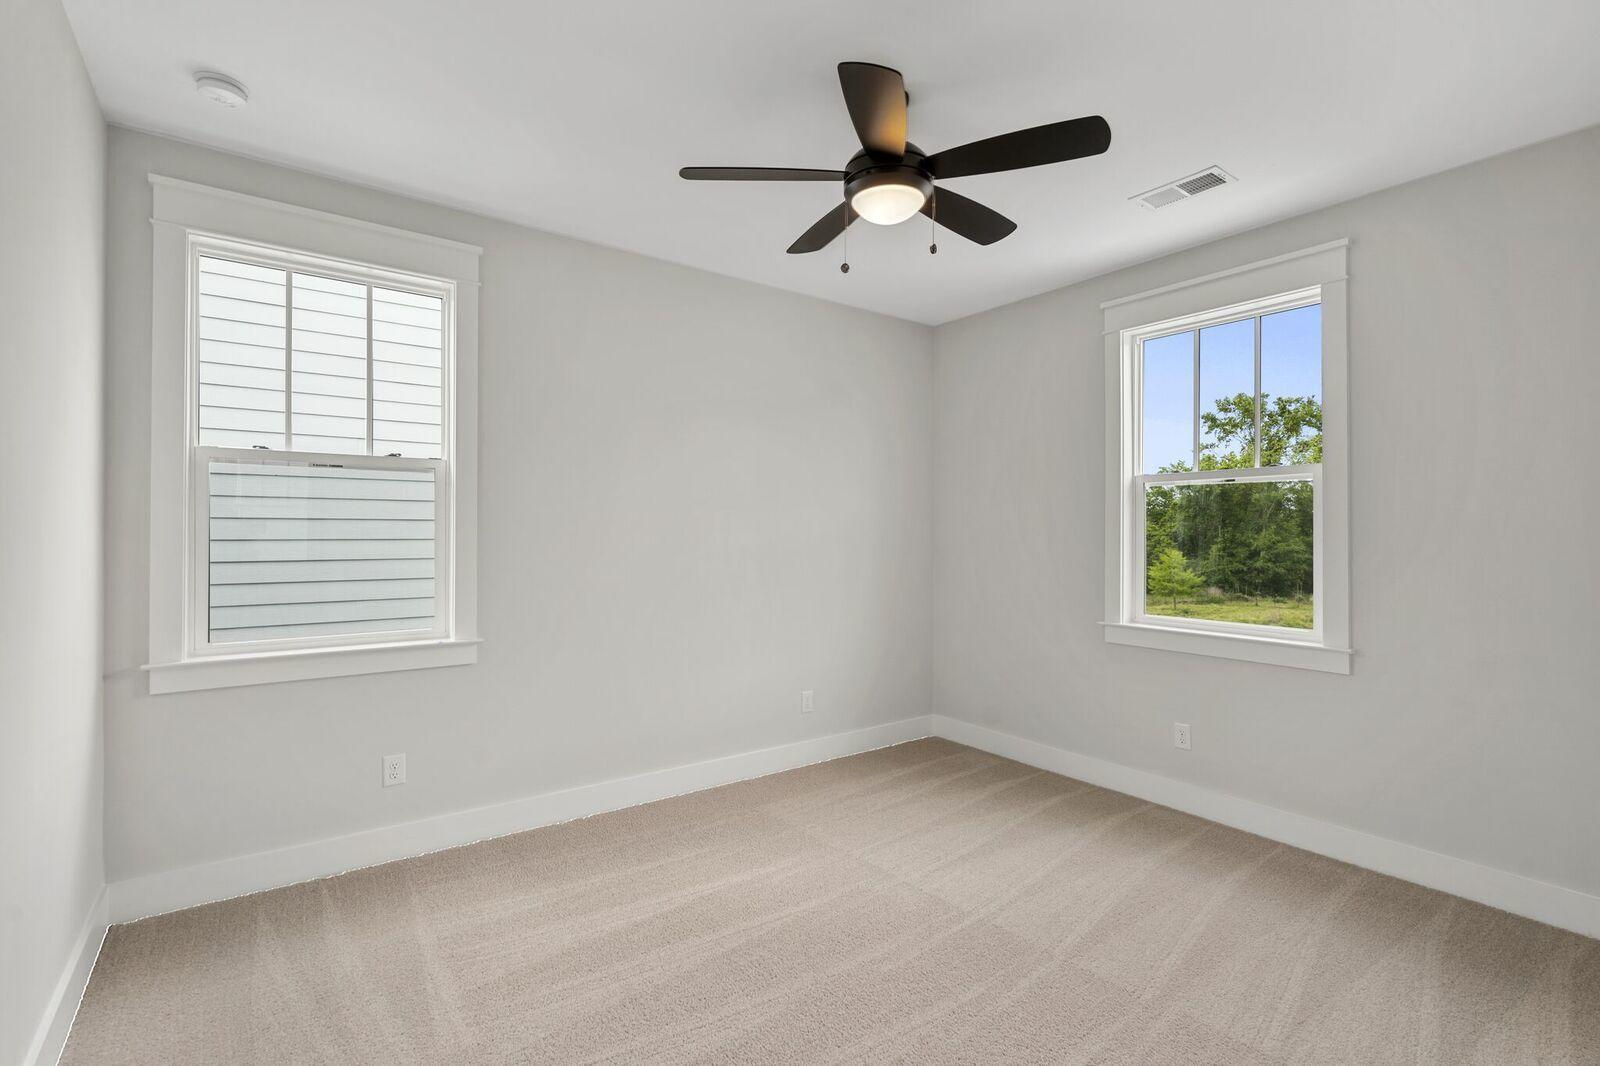 Midtown Homes For Sale - 1533 Kepley, Mount Pleasant, SC - 51